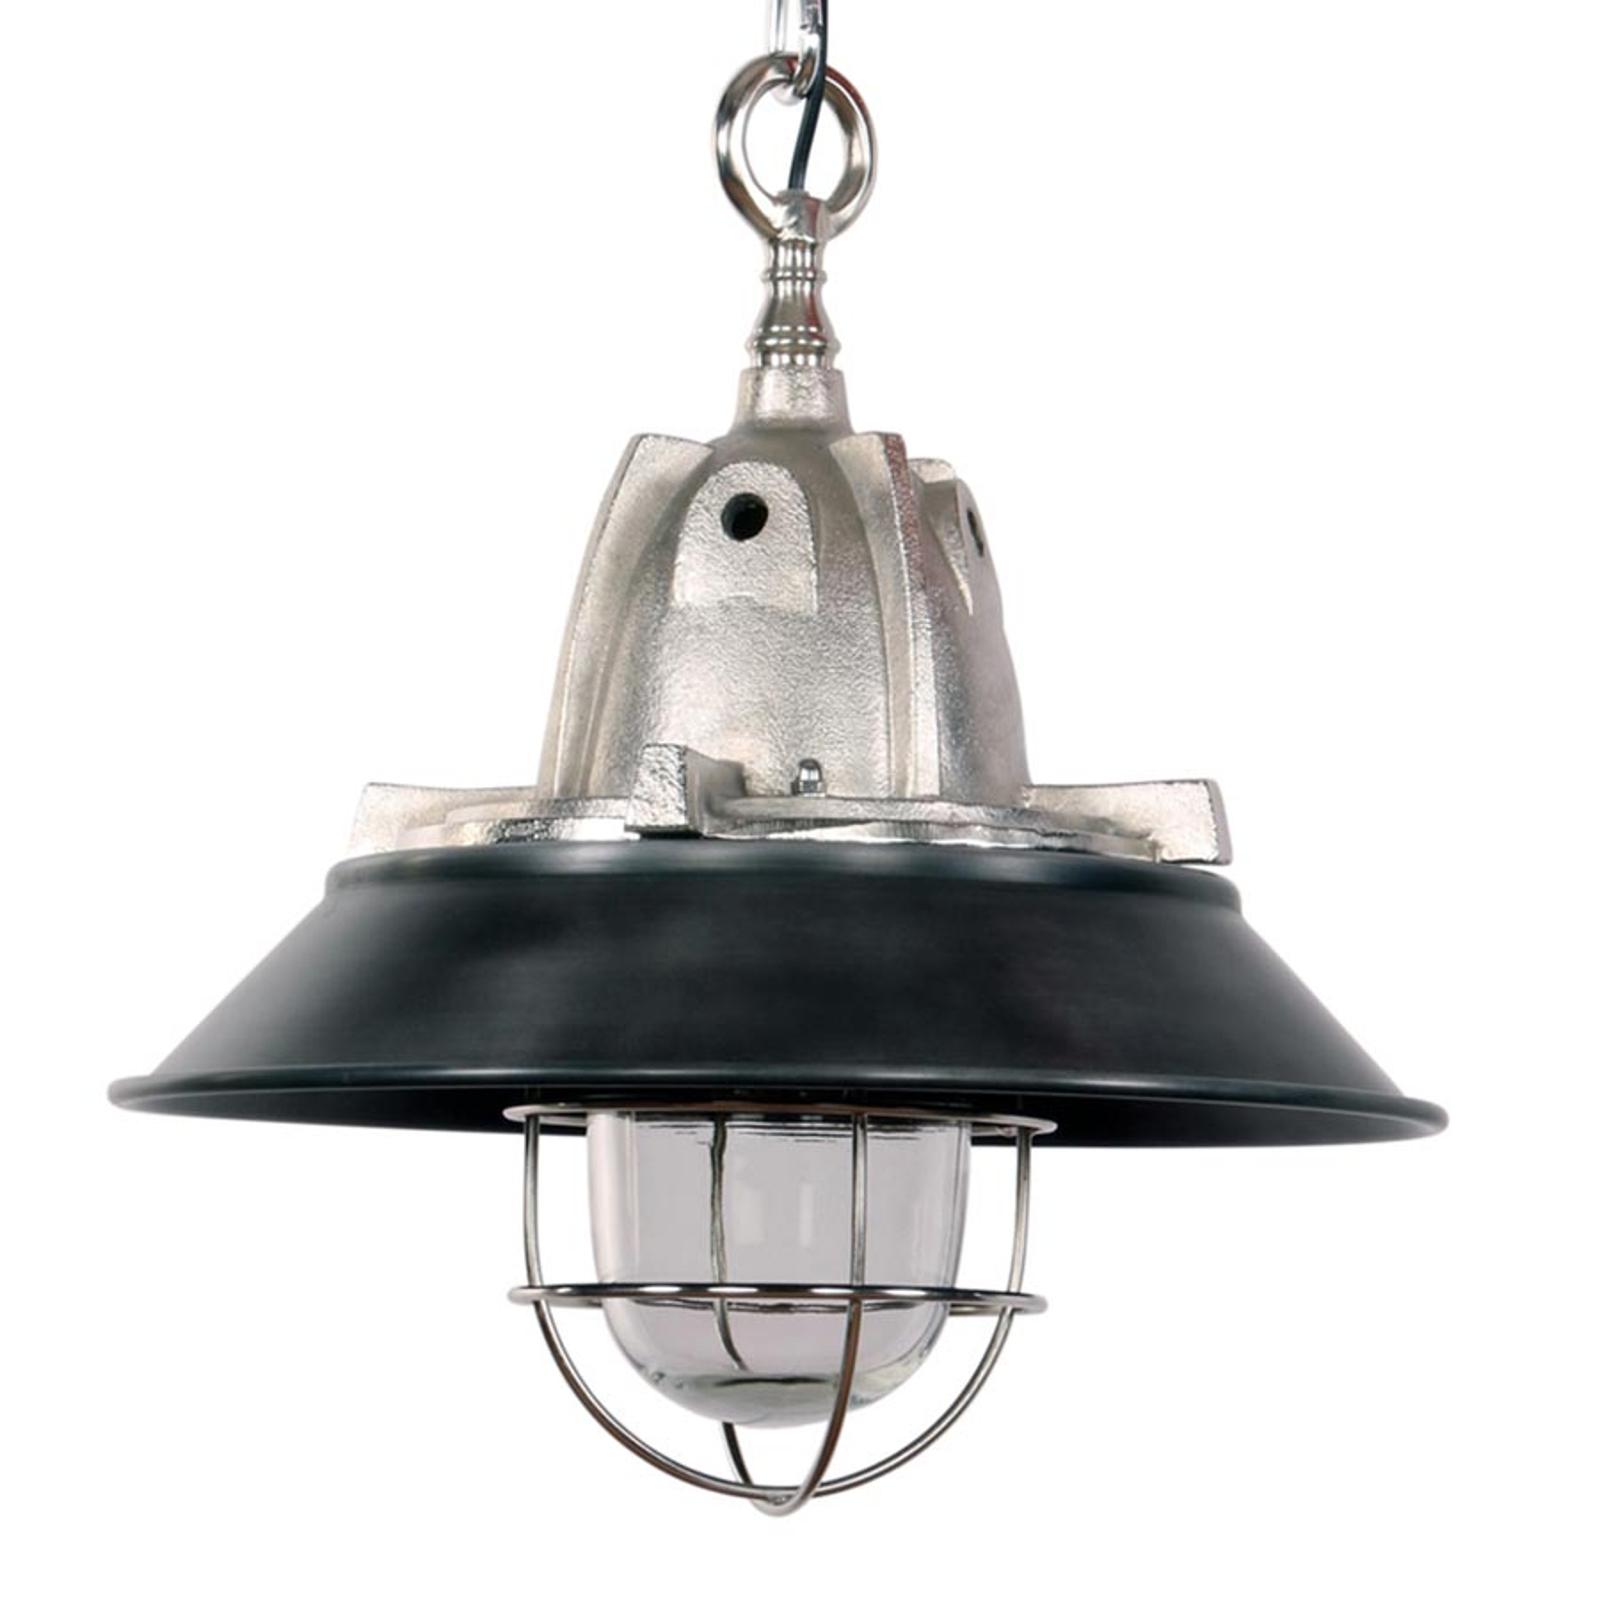 Lampada sospensione Tuk stile industriale